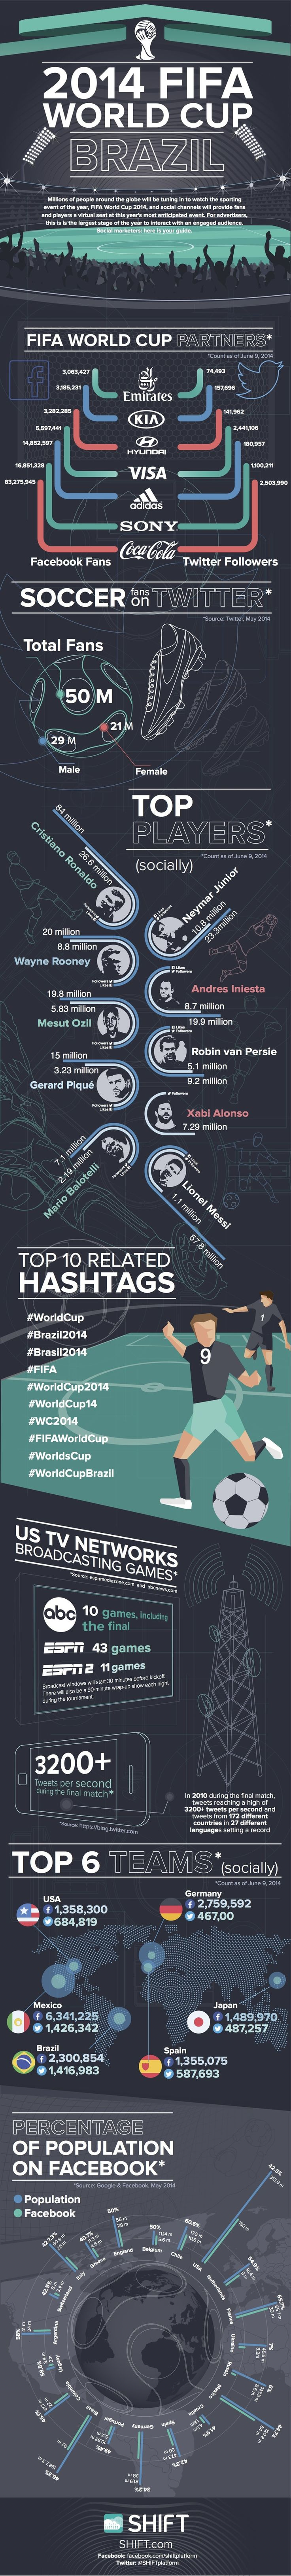 Social 2014 FIFA World Cup Brazil - AllFacebook #worldcup #brazil2014 #infographic